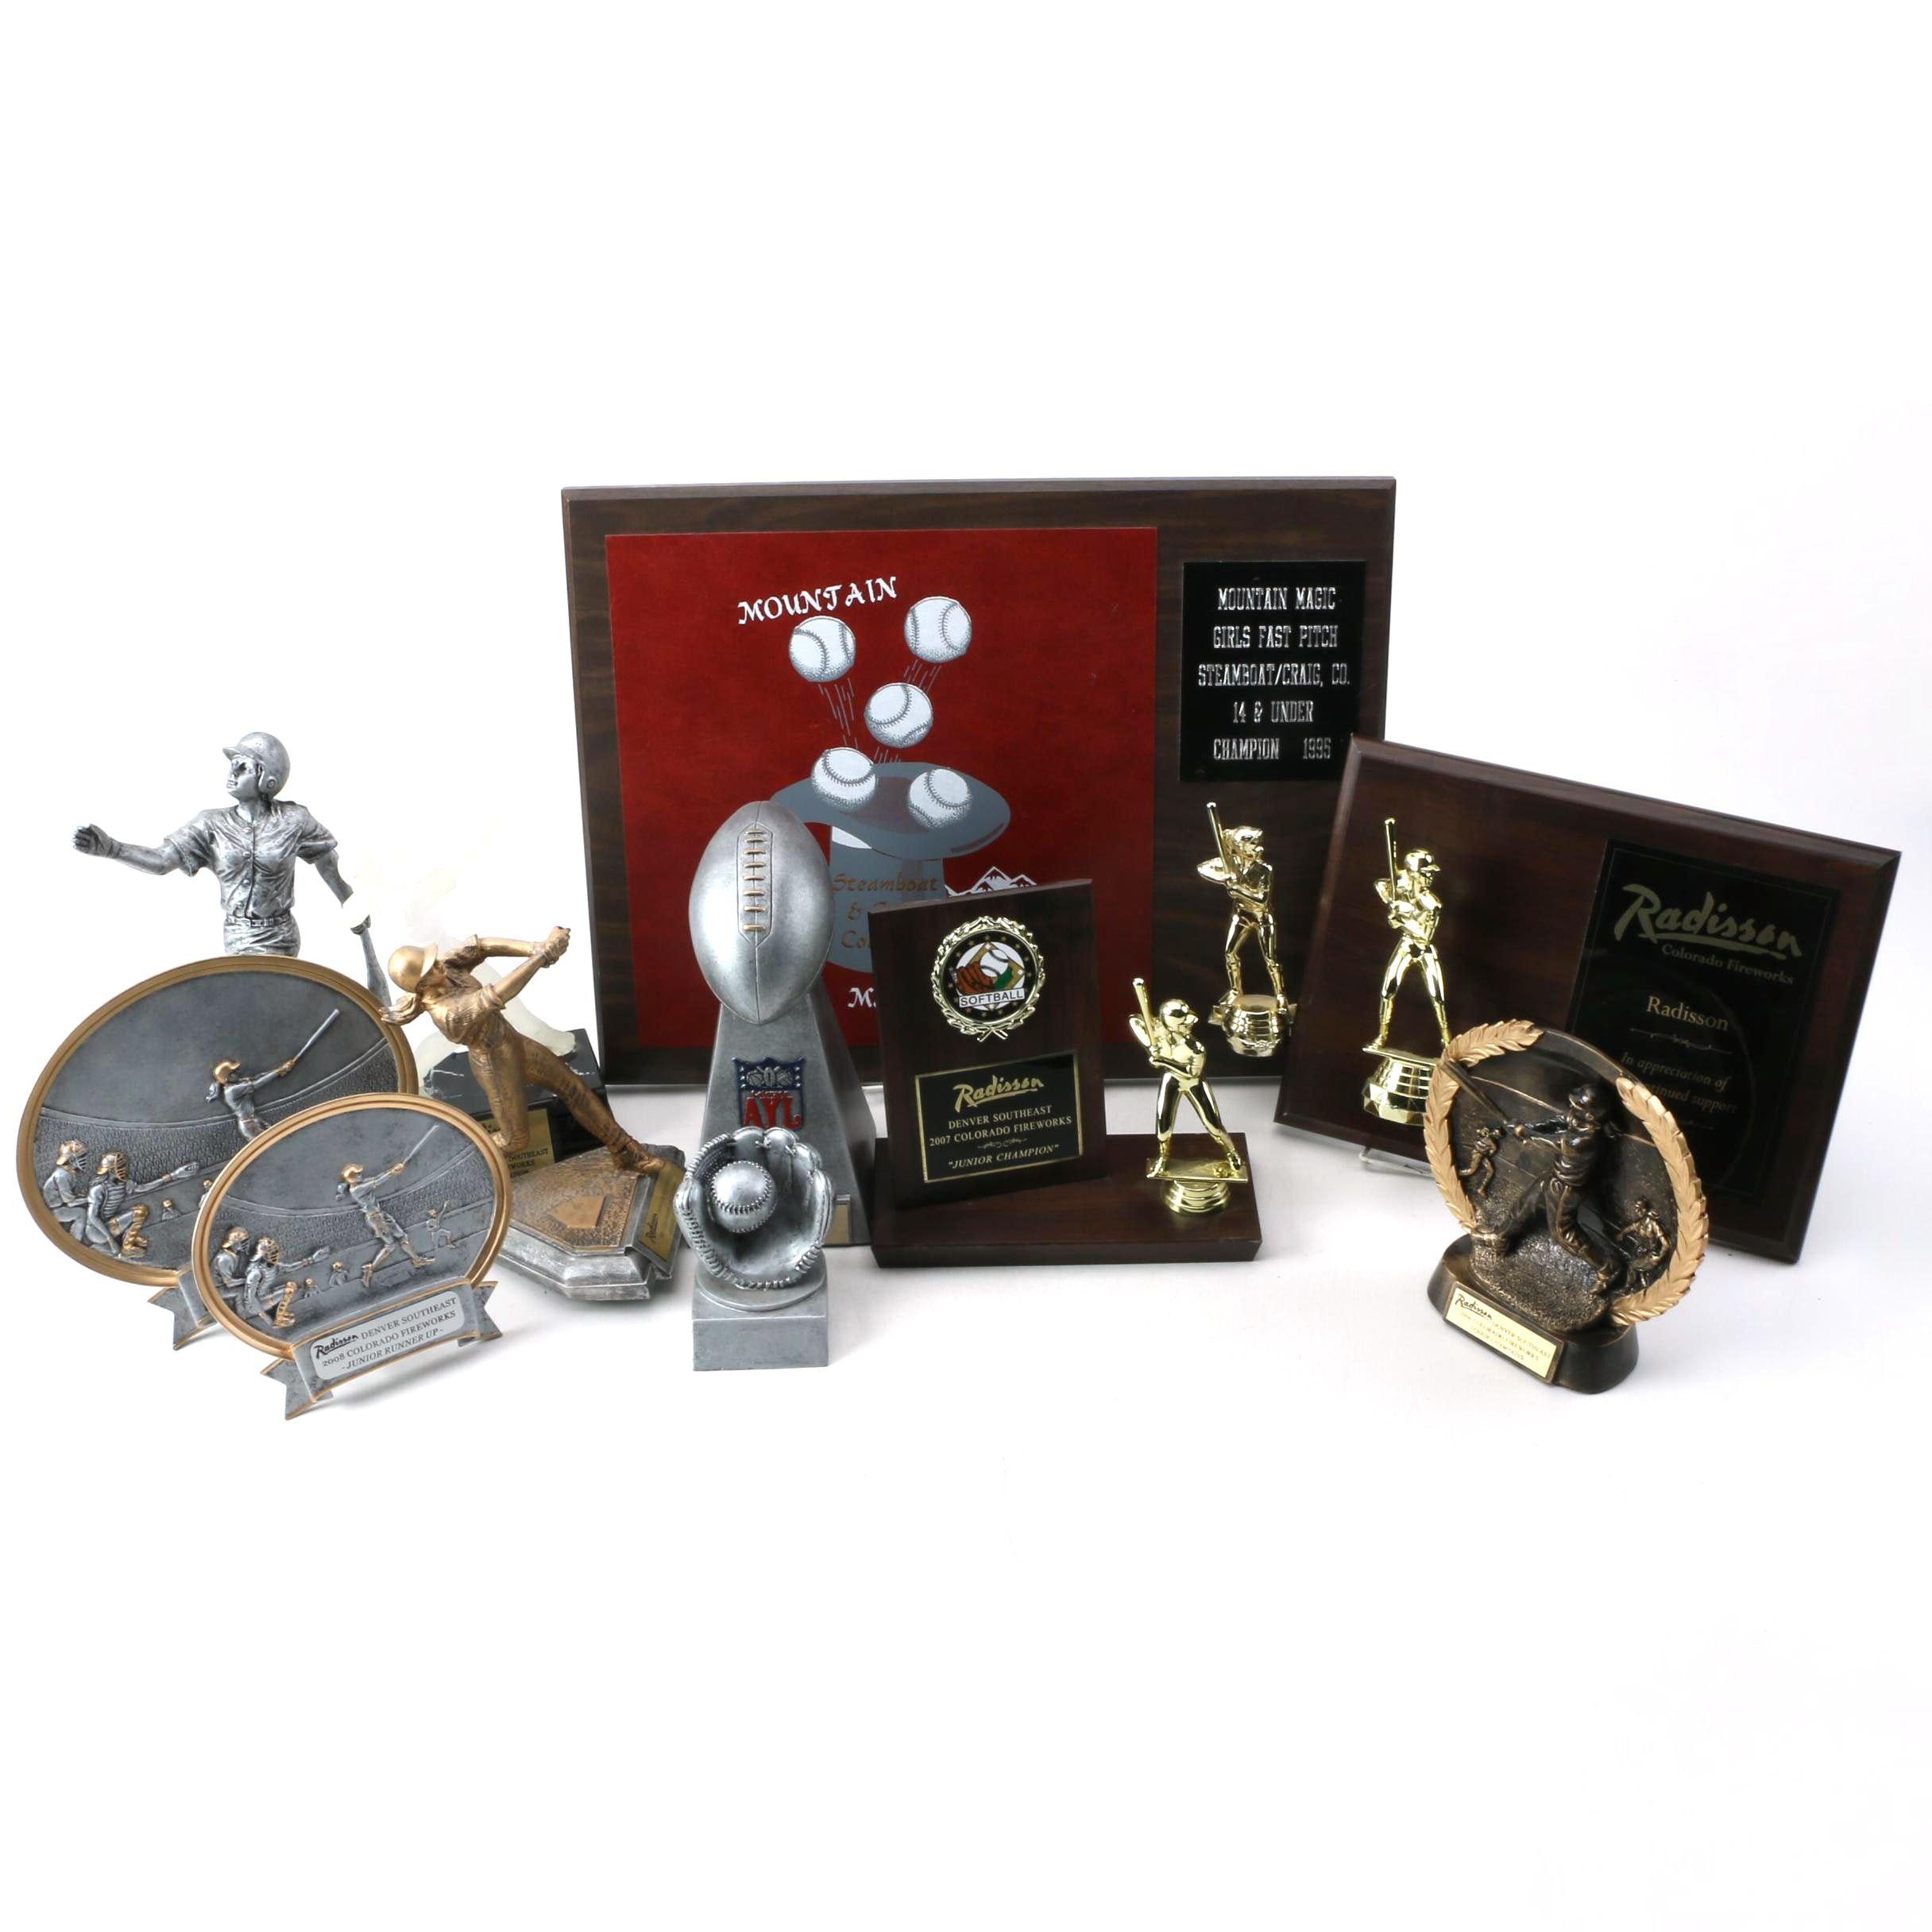 Softball and Football Trophies